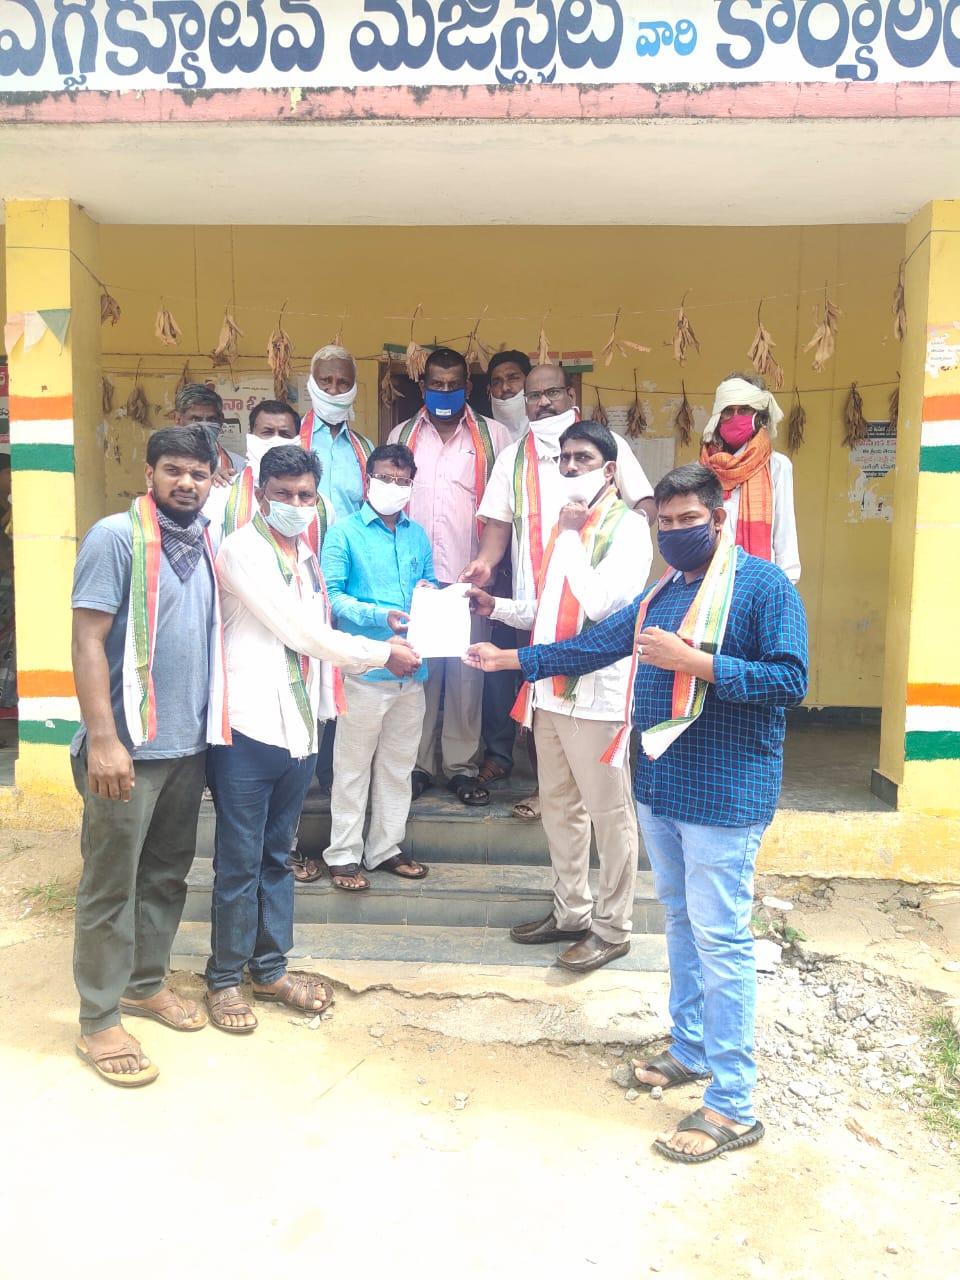 Shaik Abeed | District Youth Congress General Secretary | INC | Bhadradri Kothagudem | Sujathanagar | Kothagudem | Telangana | Mandal President | NSUI | Youth Congress Incharge | Mandal Co-Option Member | NSUI Incharge | theLeadersPage